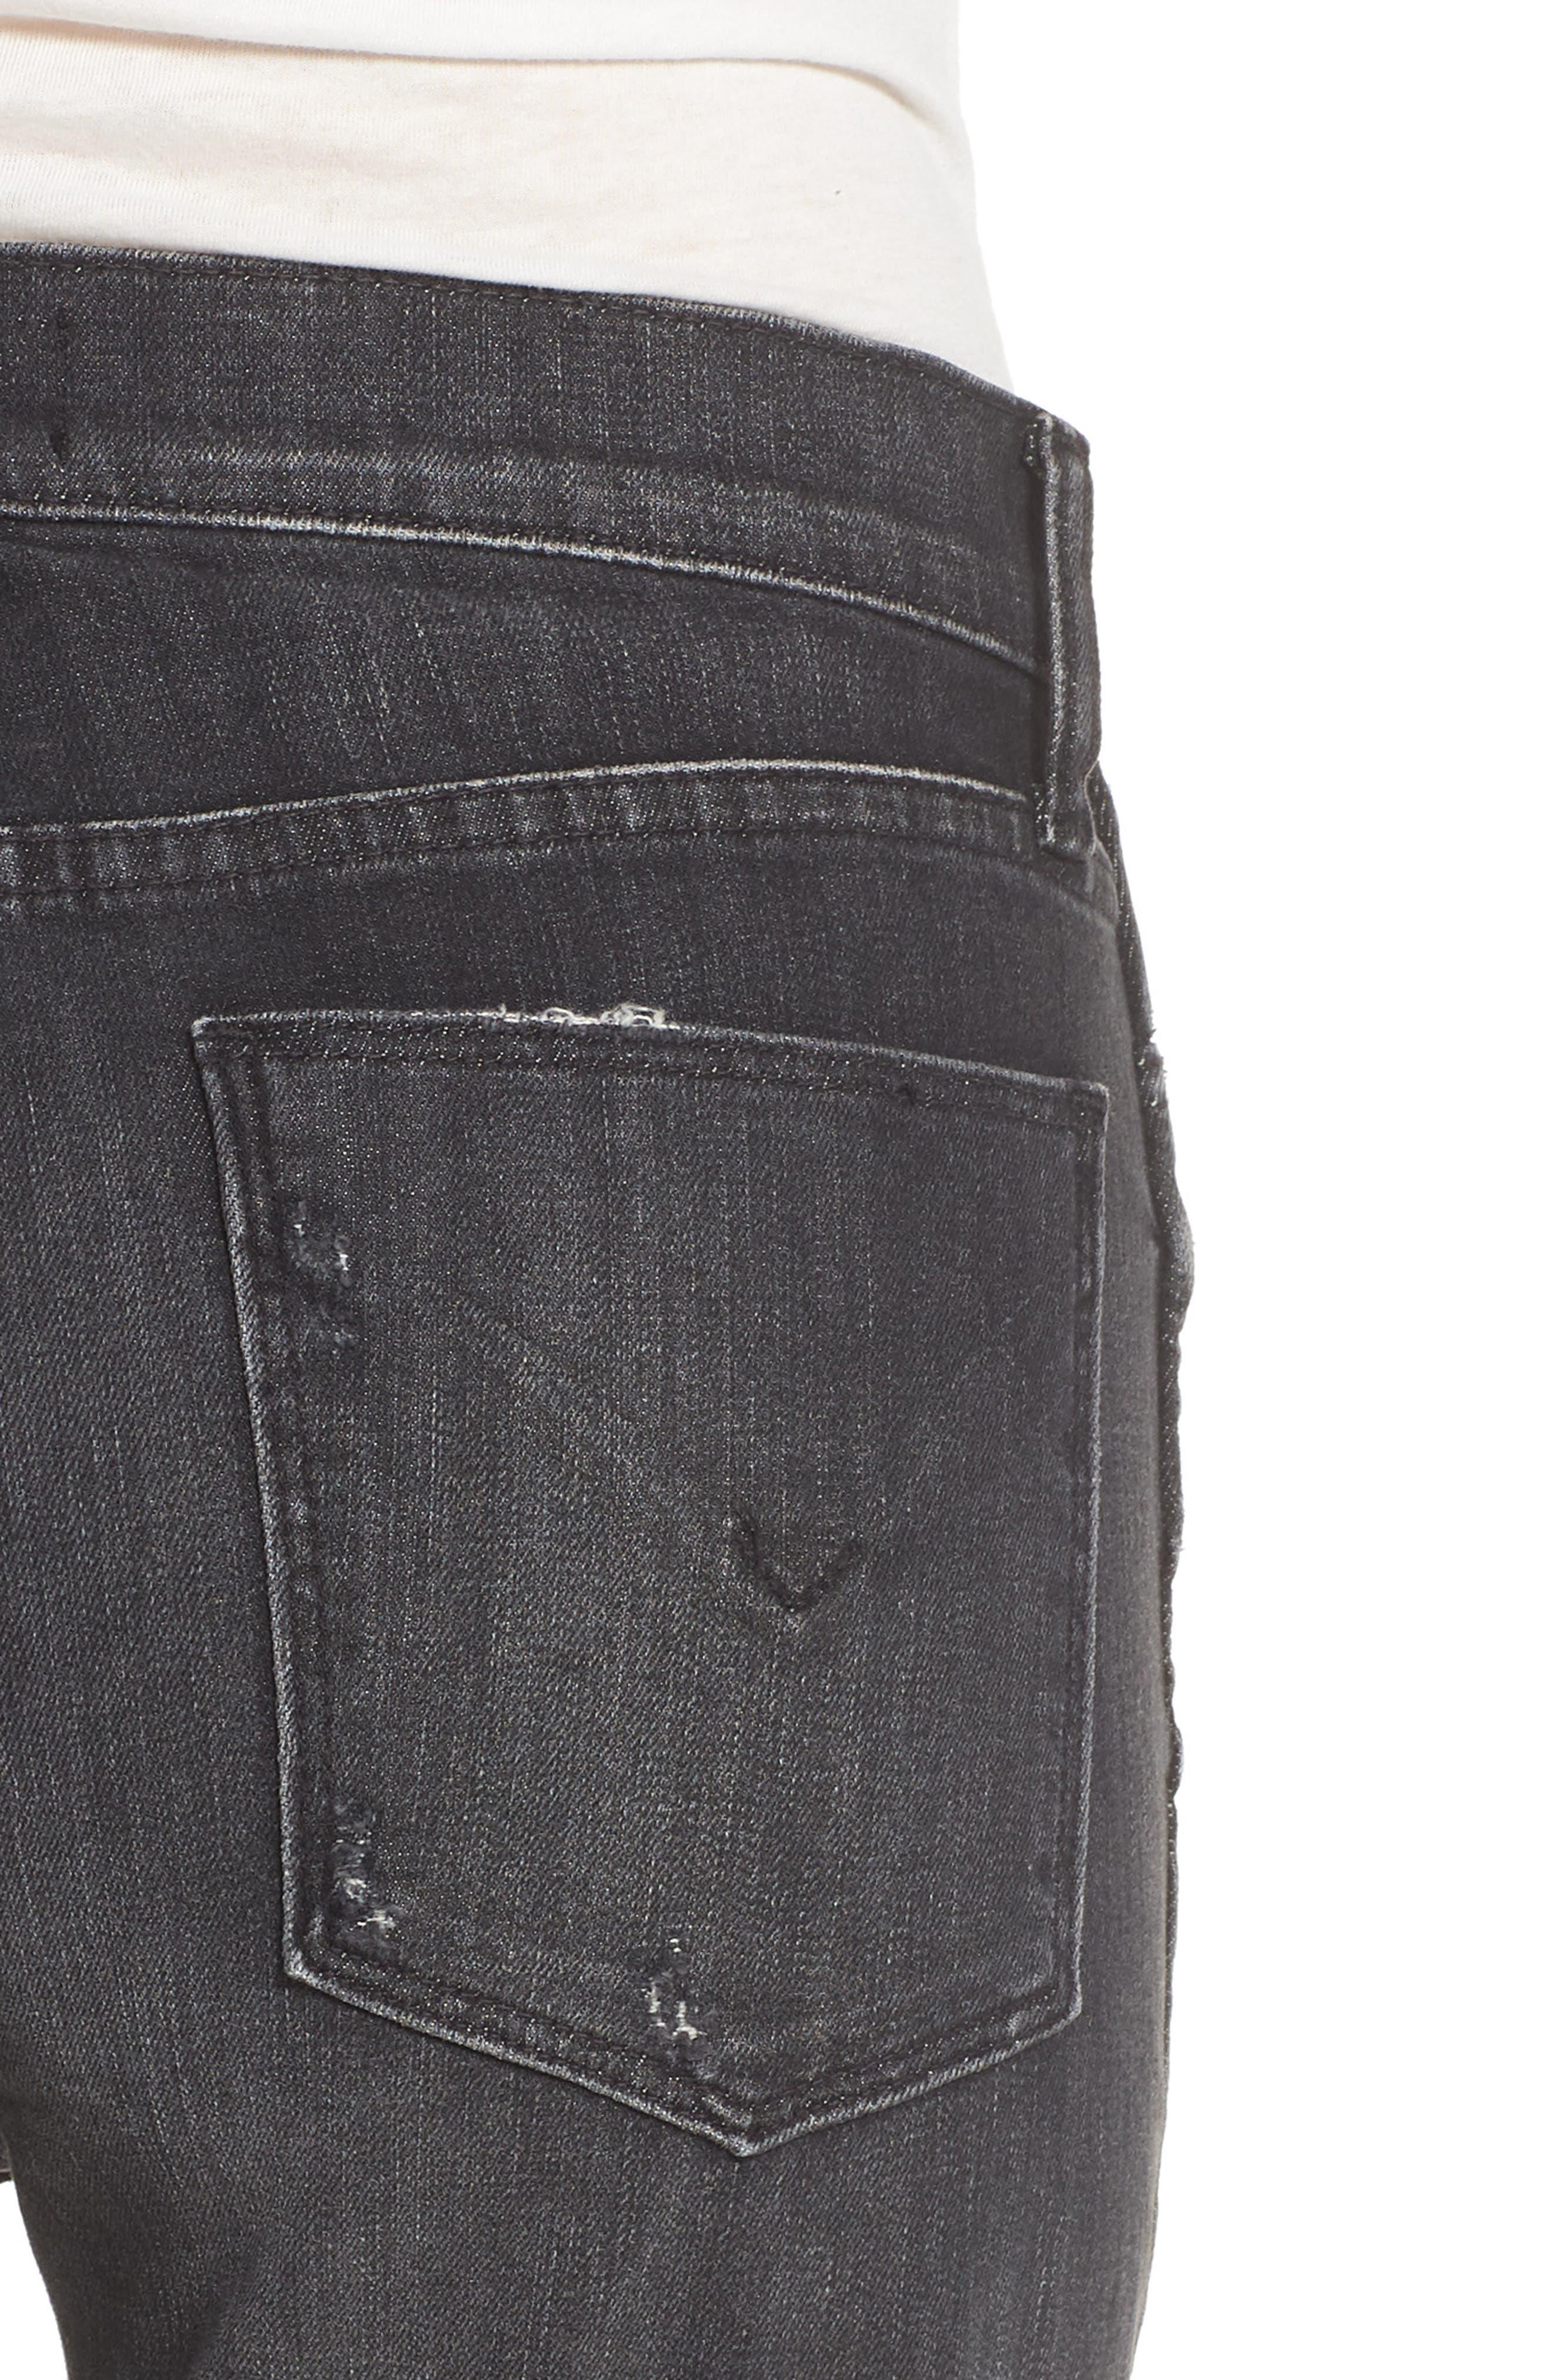 Vintage Holly High Waist Crop Skinny Jeans,                             Alternate thumbnail 4, color,                             Jawbreaker